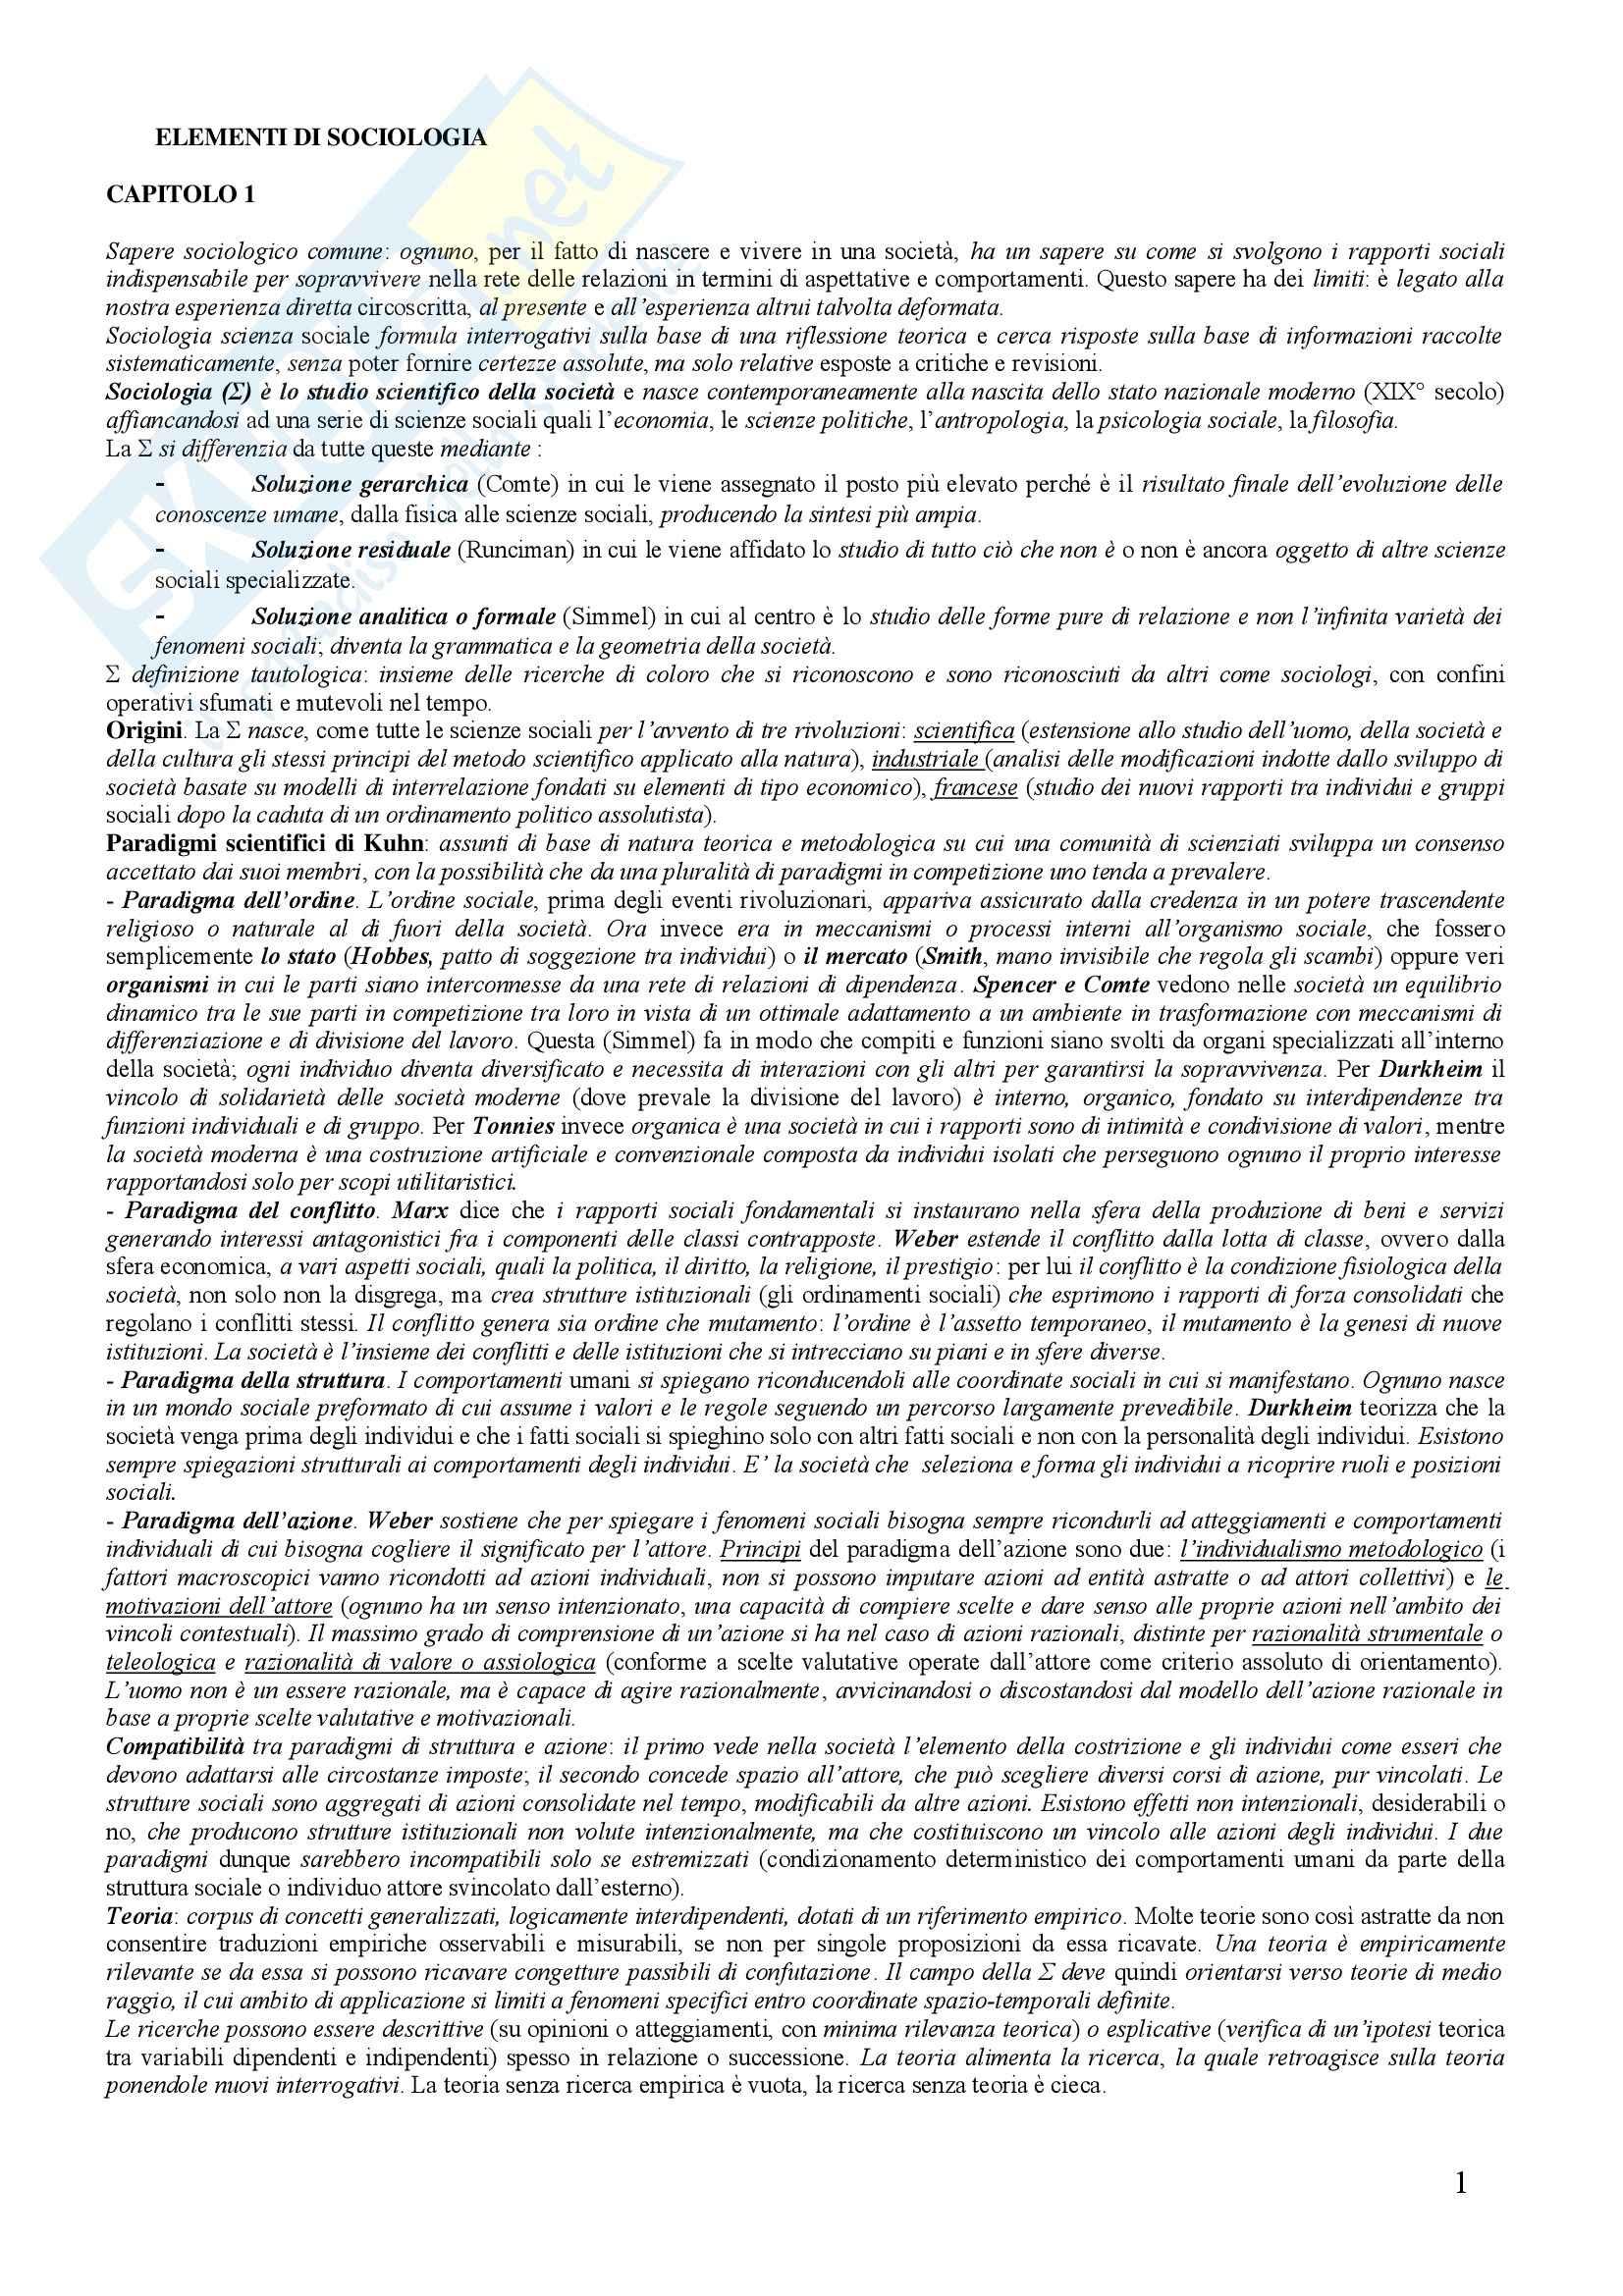 Sociologia generale – Elementi